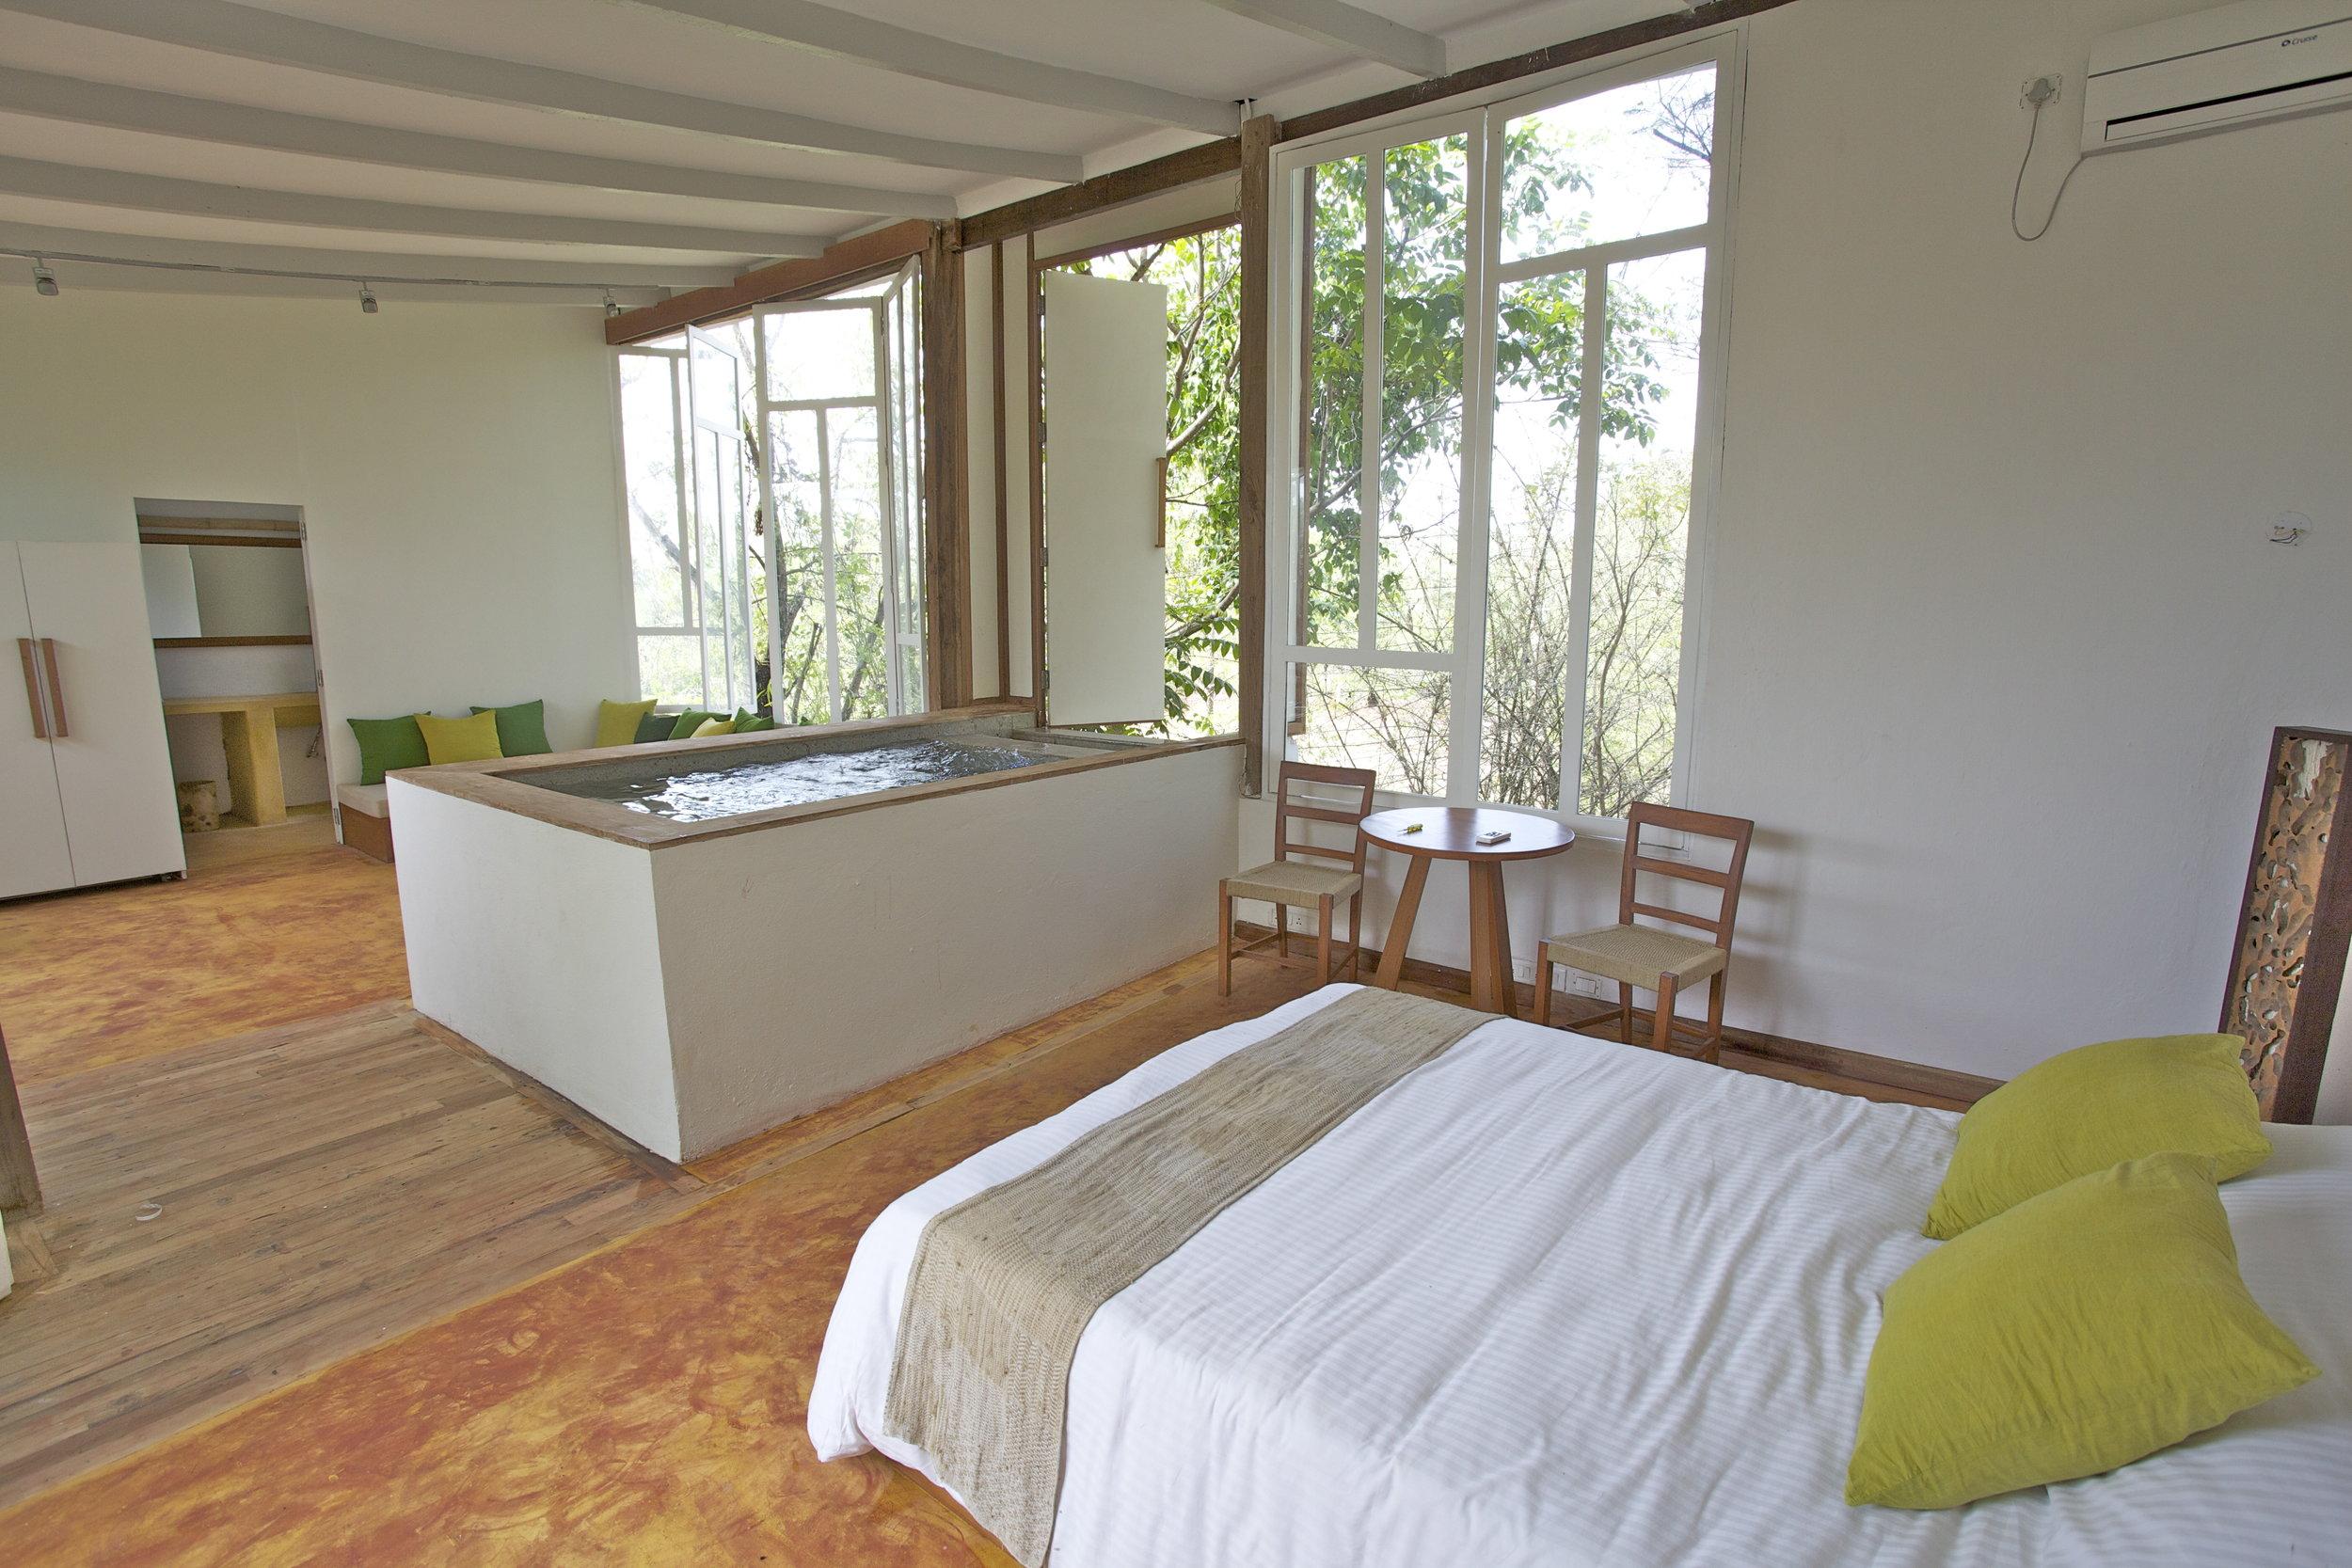 Honeymoon Loft Bedroom Area.jpg